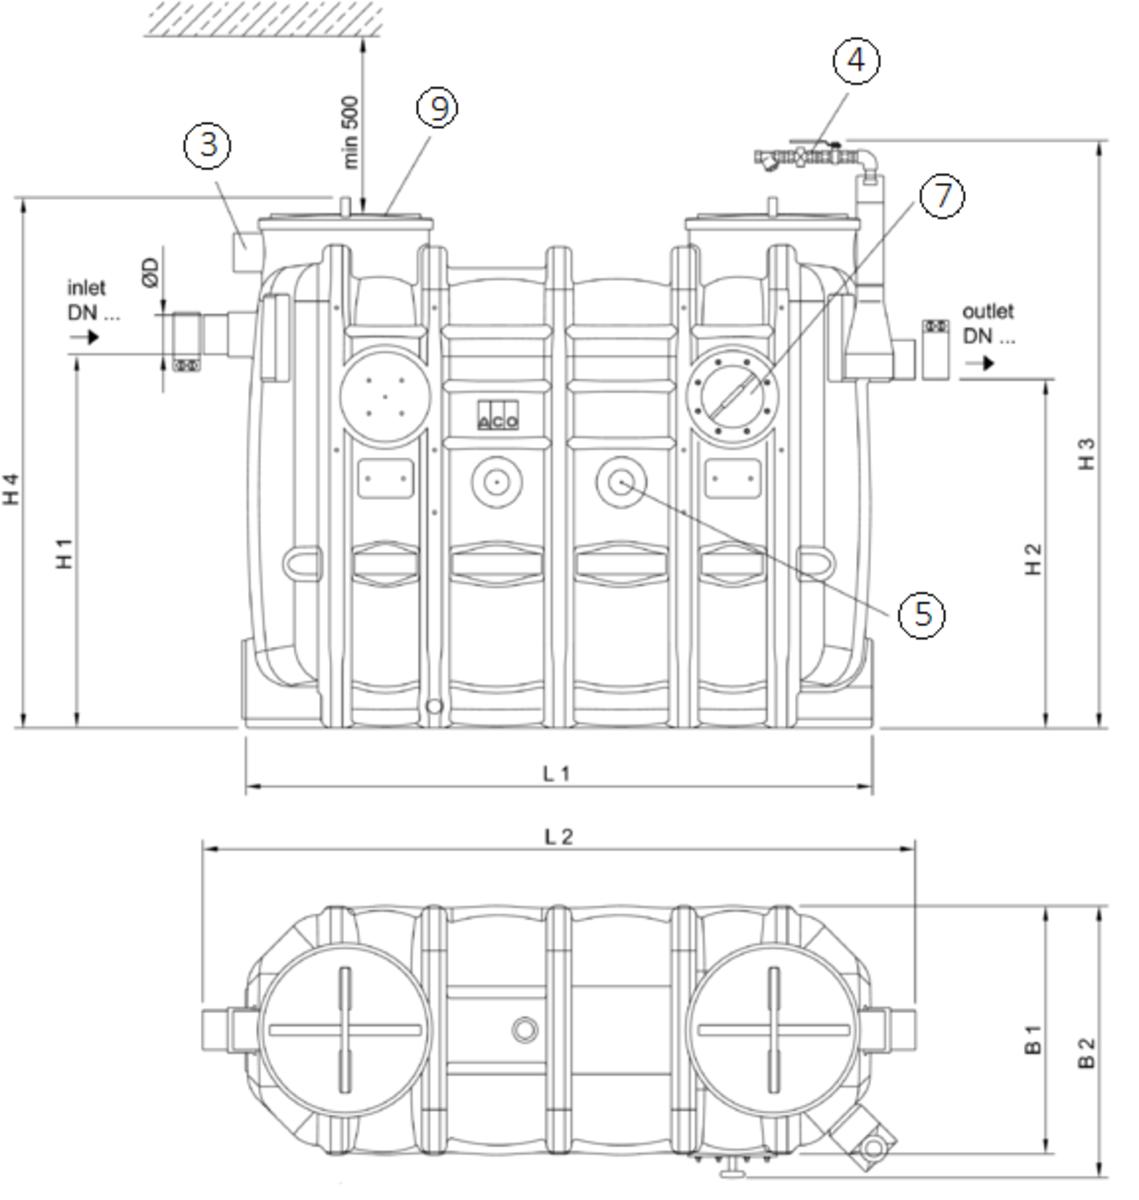 Esquema técnico generico del separador de grasas aéreo LIPUJET-P-OB de polietileno de alta densidad (HDPE), ovalado.